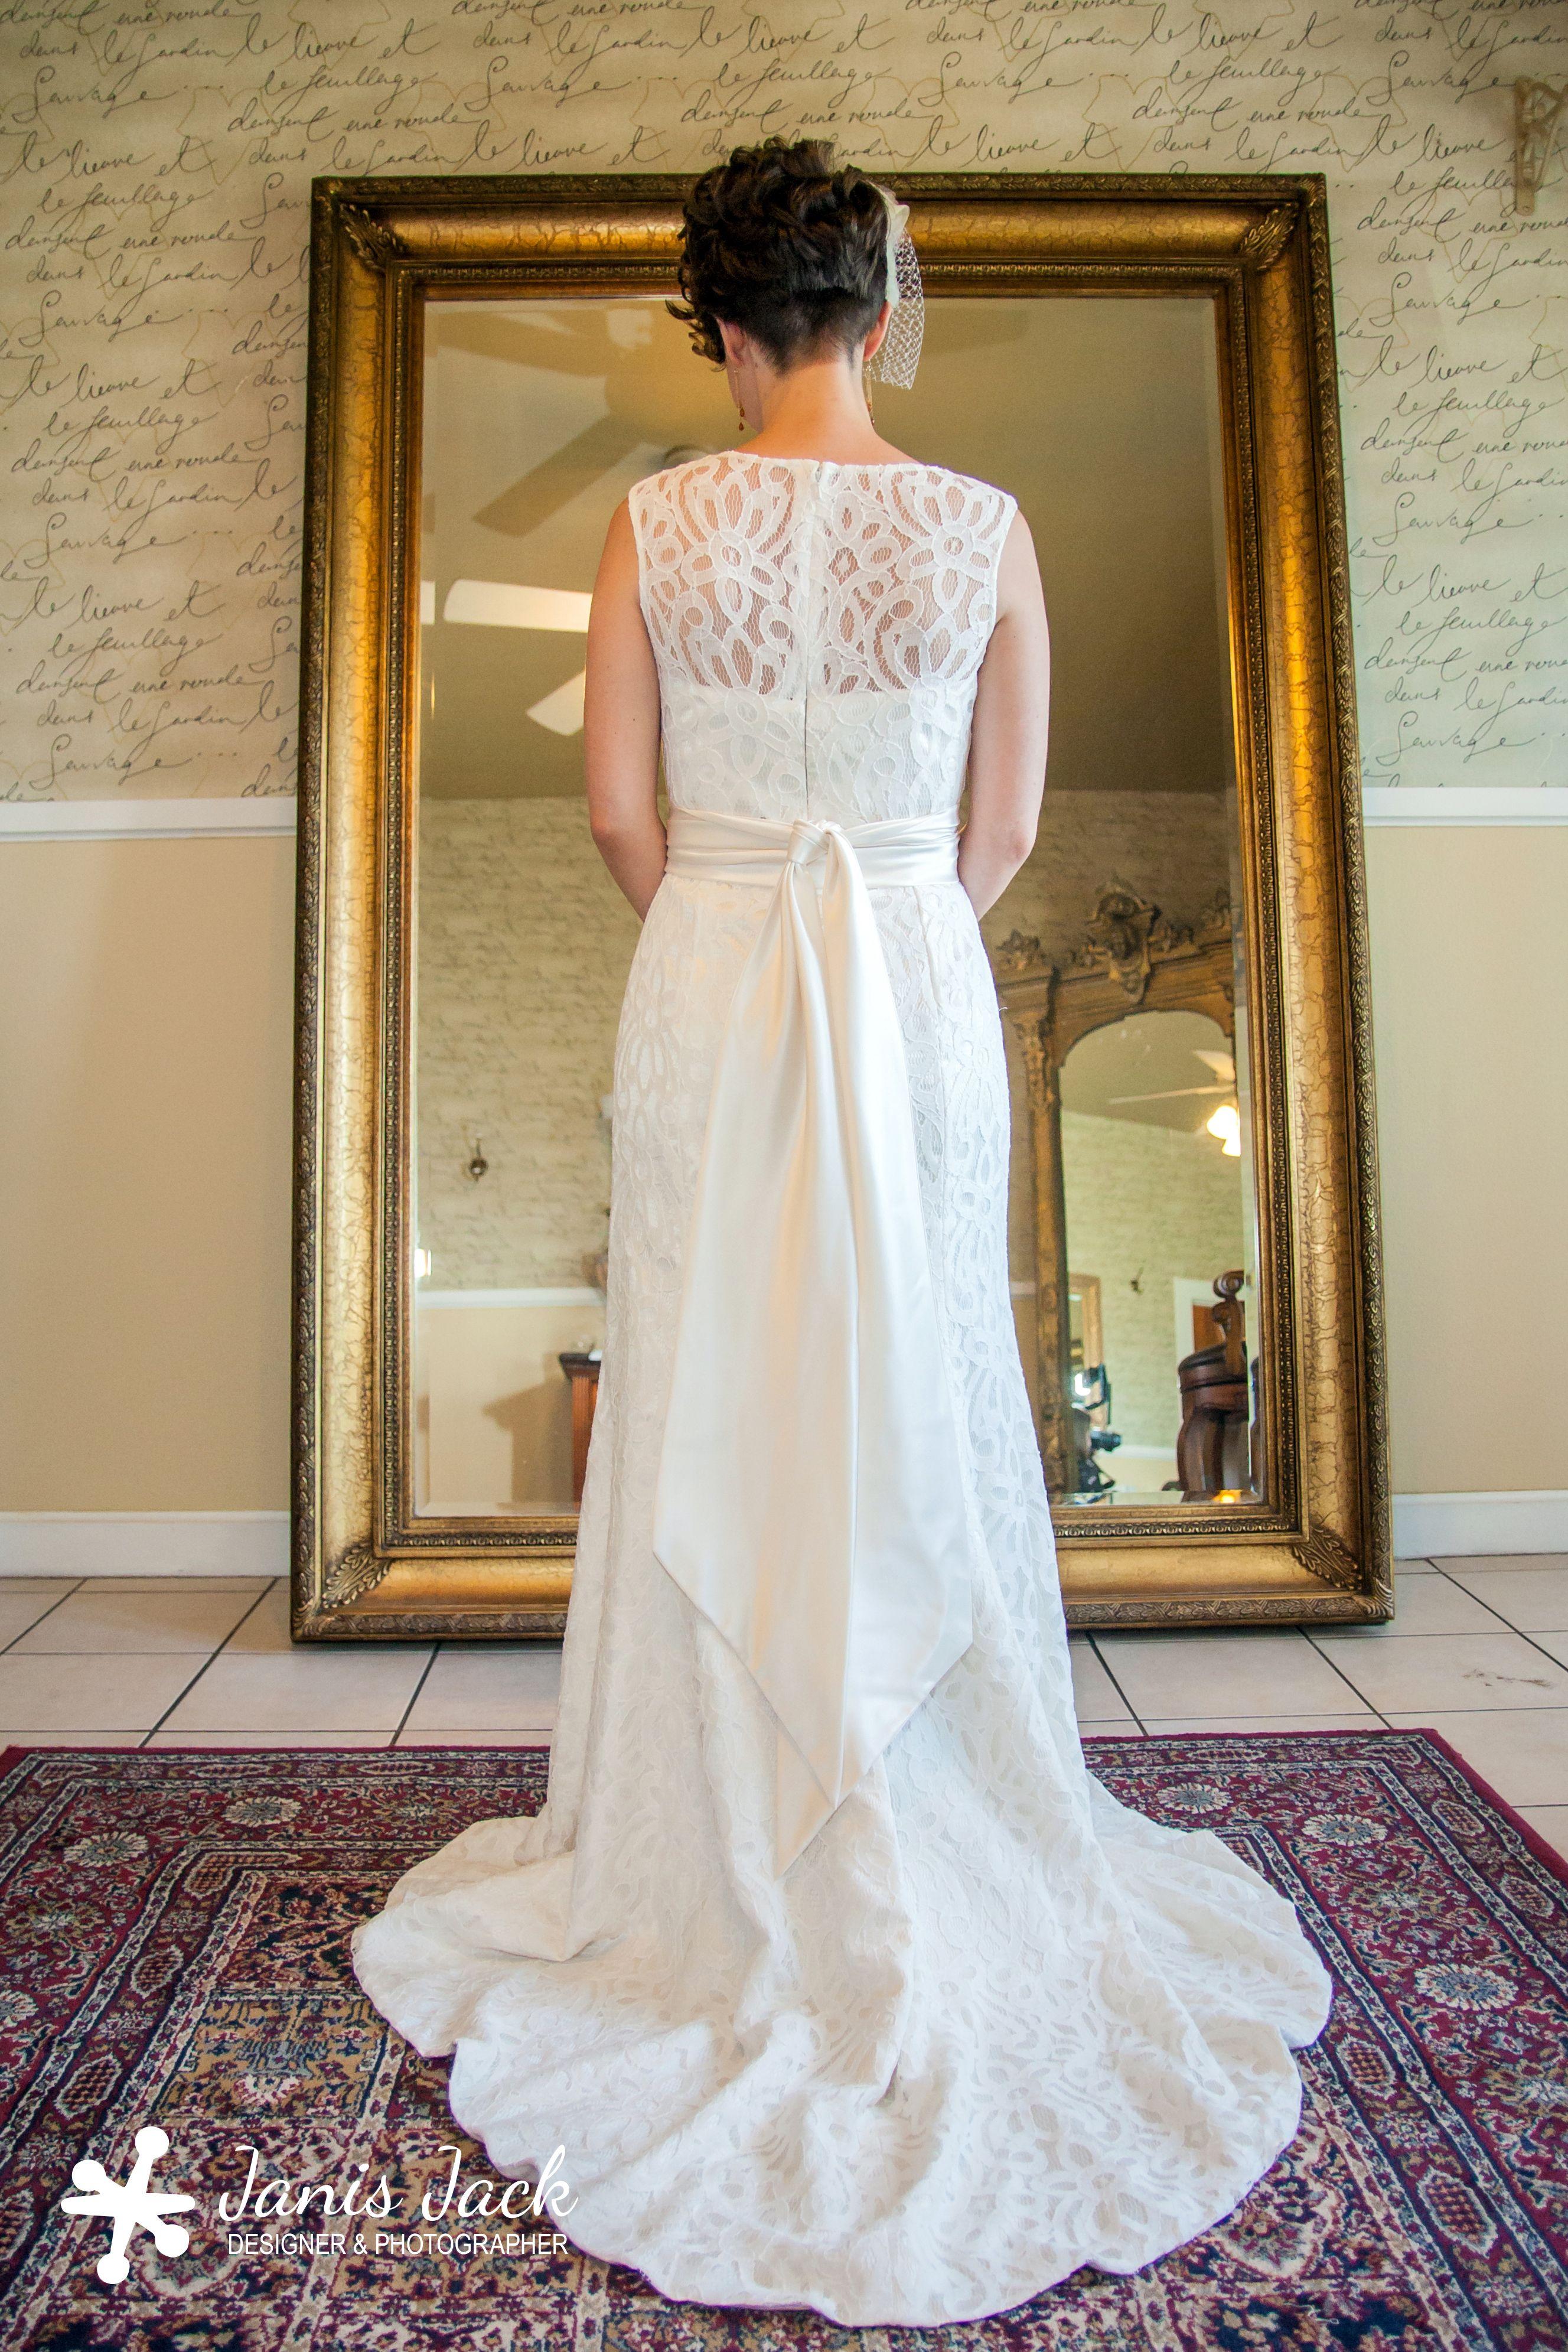 wedding, dress, vail, ideas, photography, mirror, lace